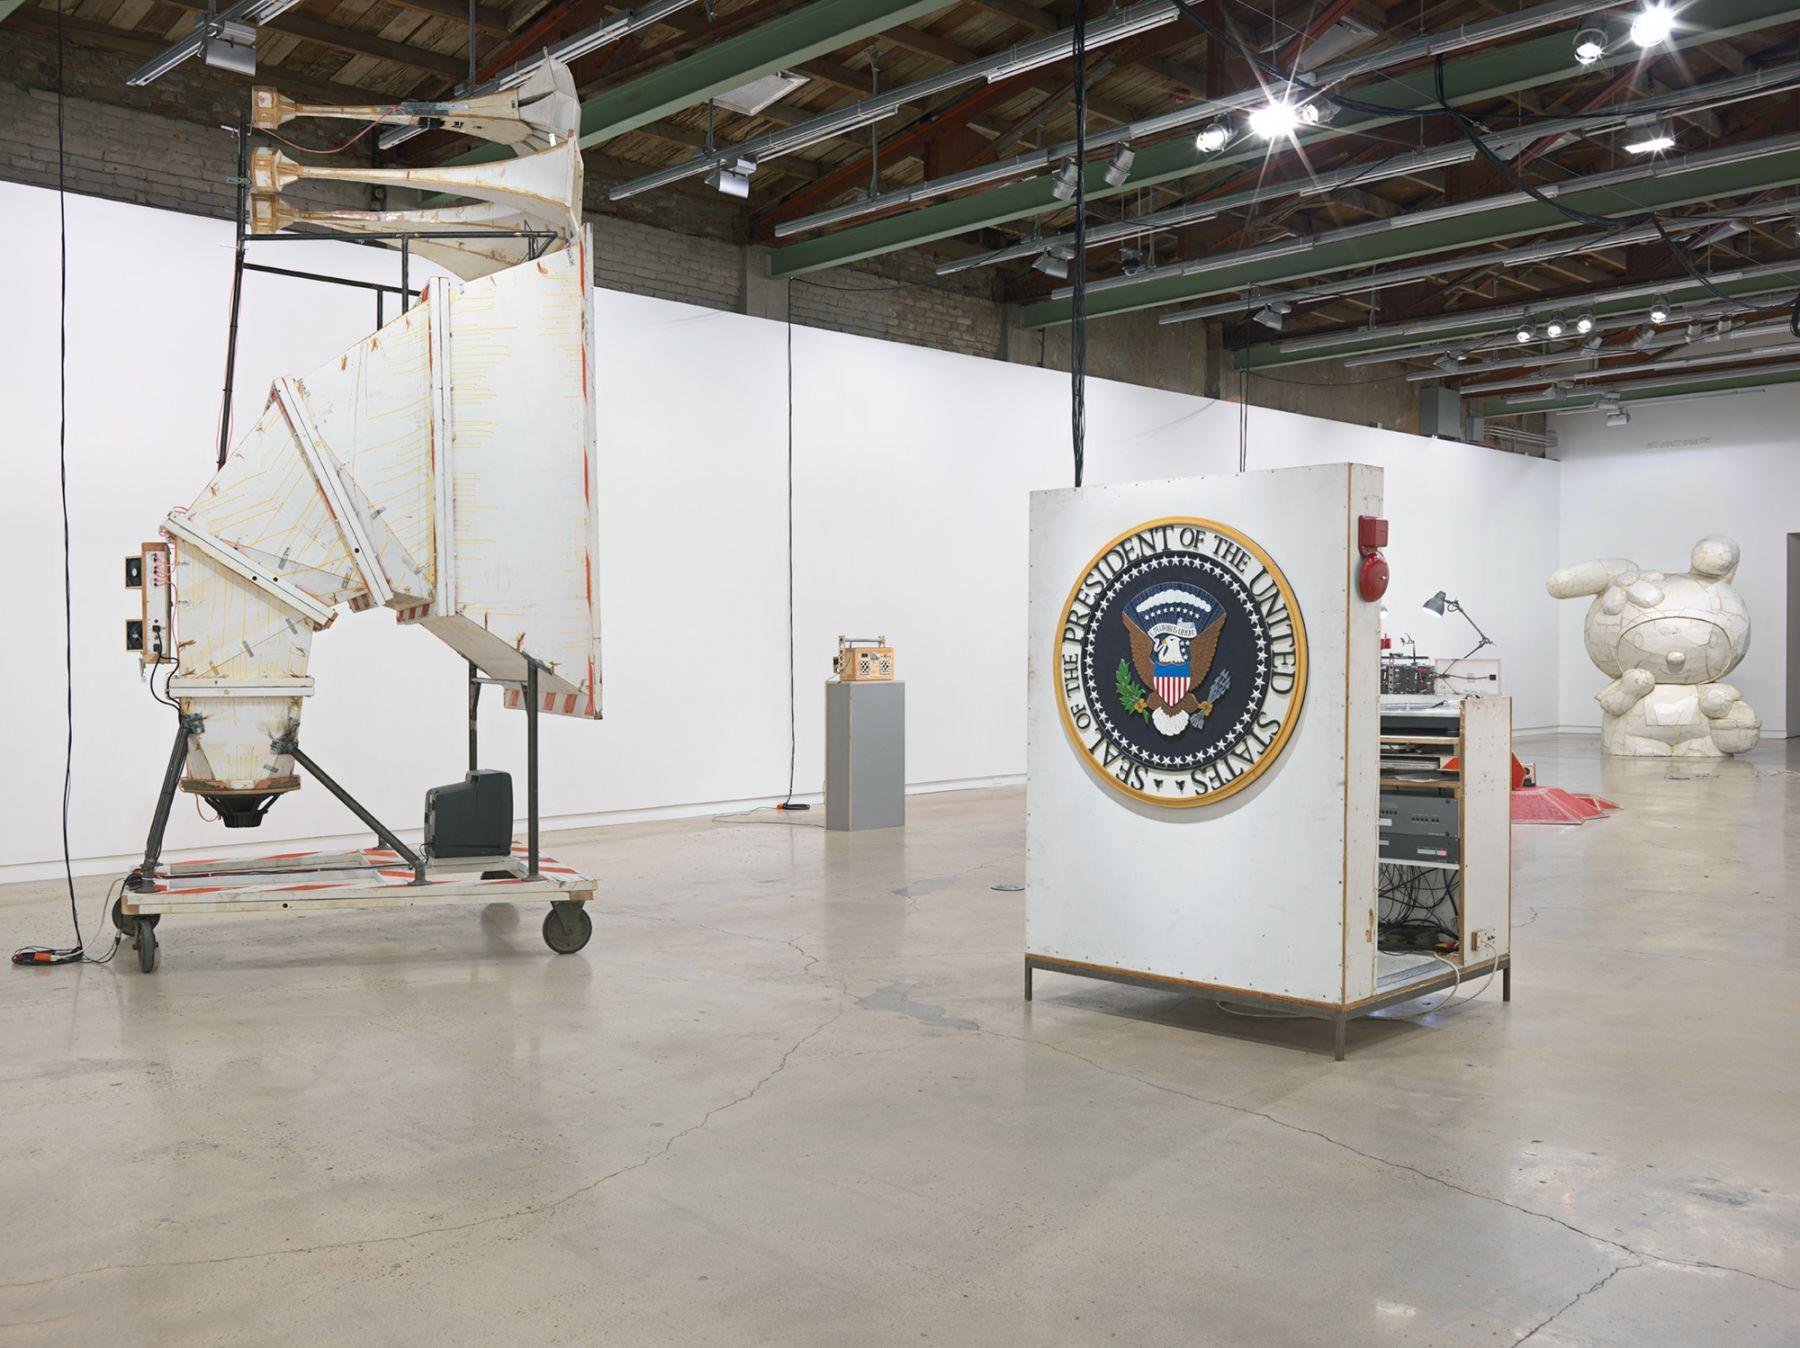 Installation view, Tom Sachs, Boombox Retrospective, 1999-2015, The Contemporary Austin, Austin, TX, 2015